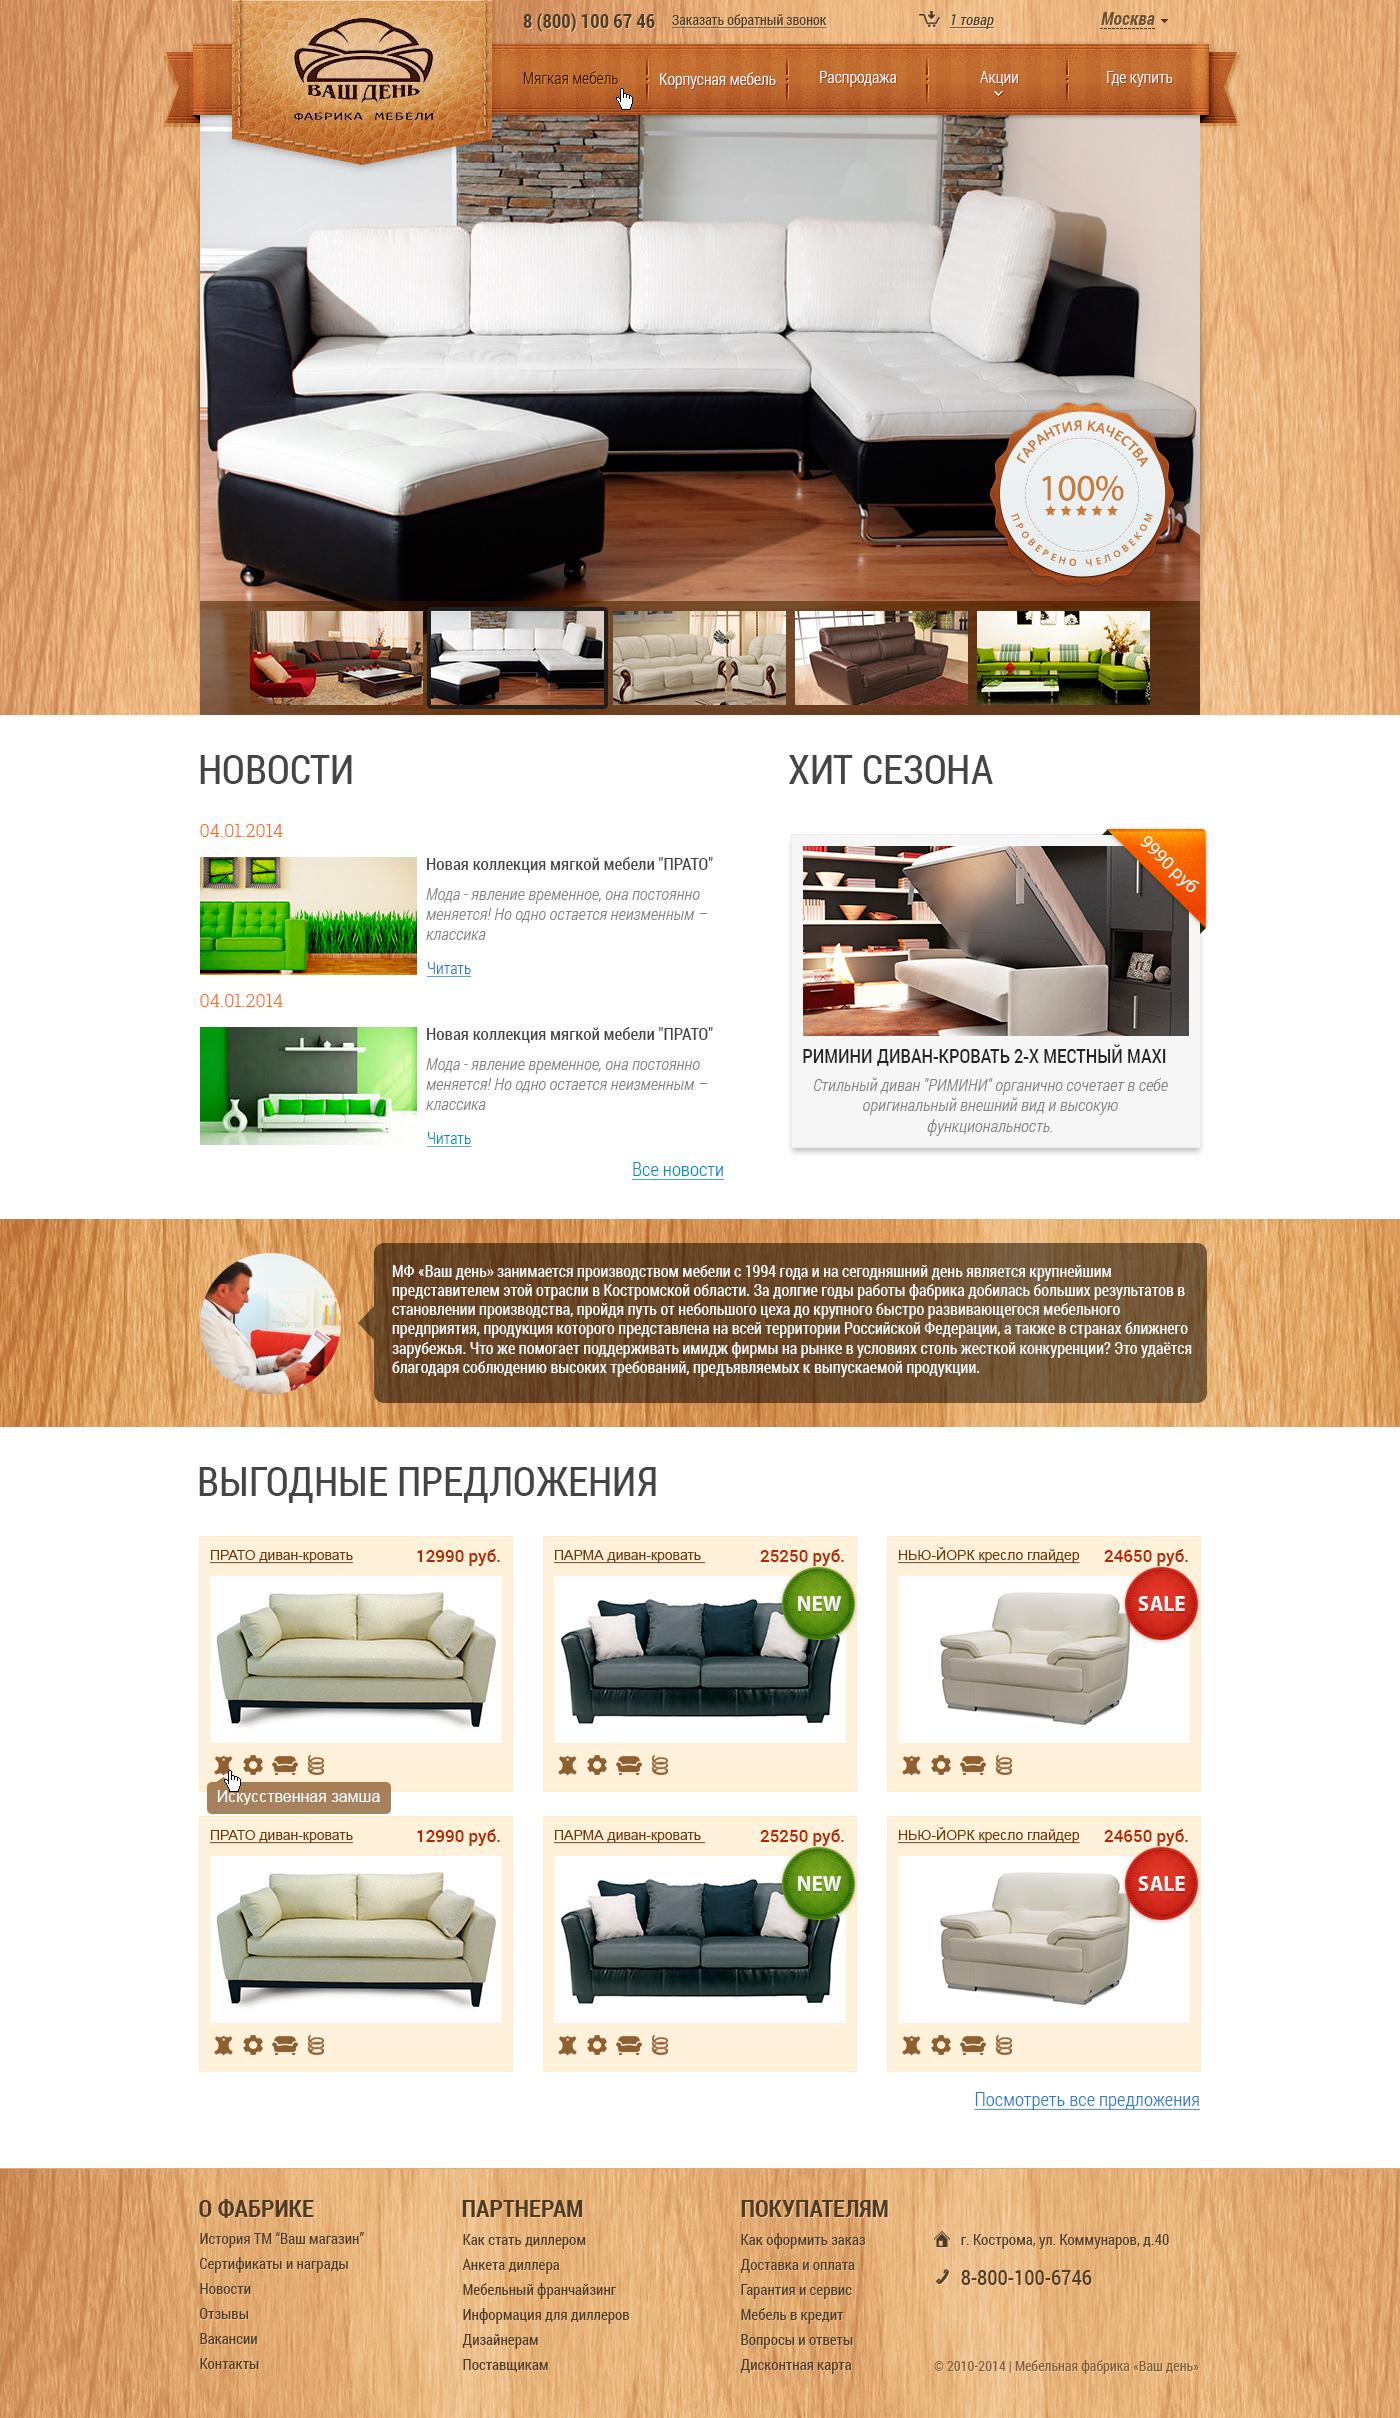 Разработать дизайн для интернет-магазина мебели фото f_96352e9472cd6075.jpg